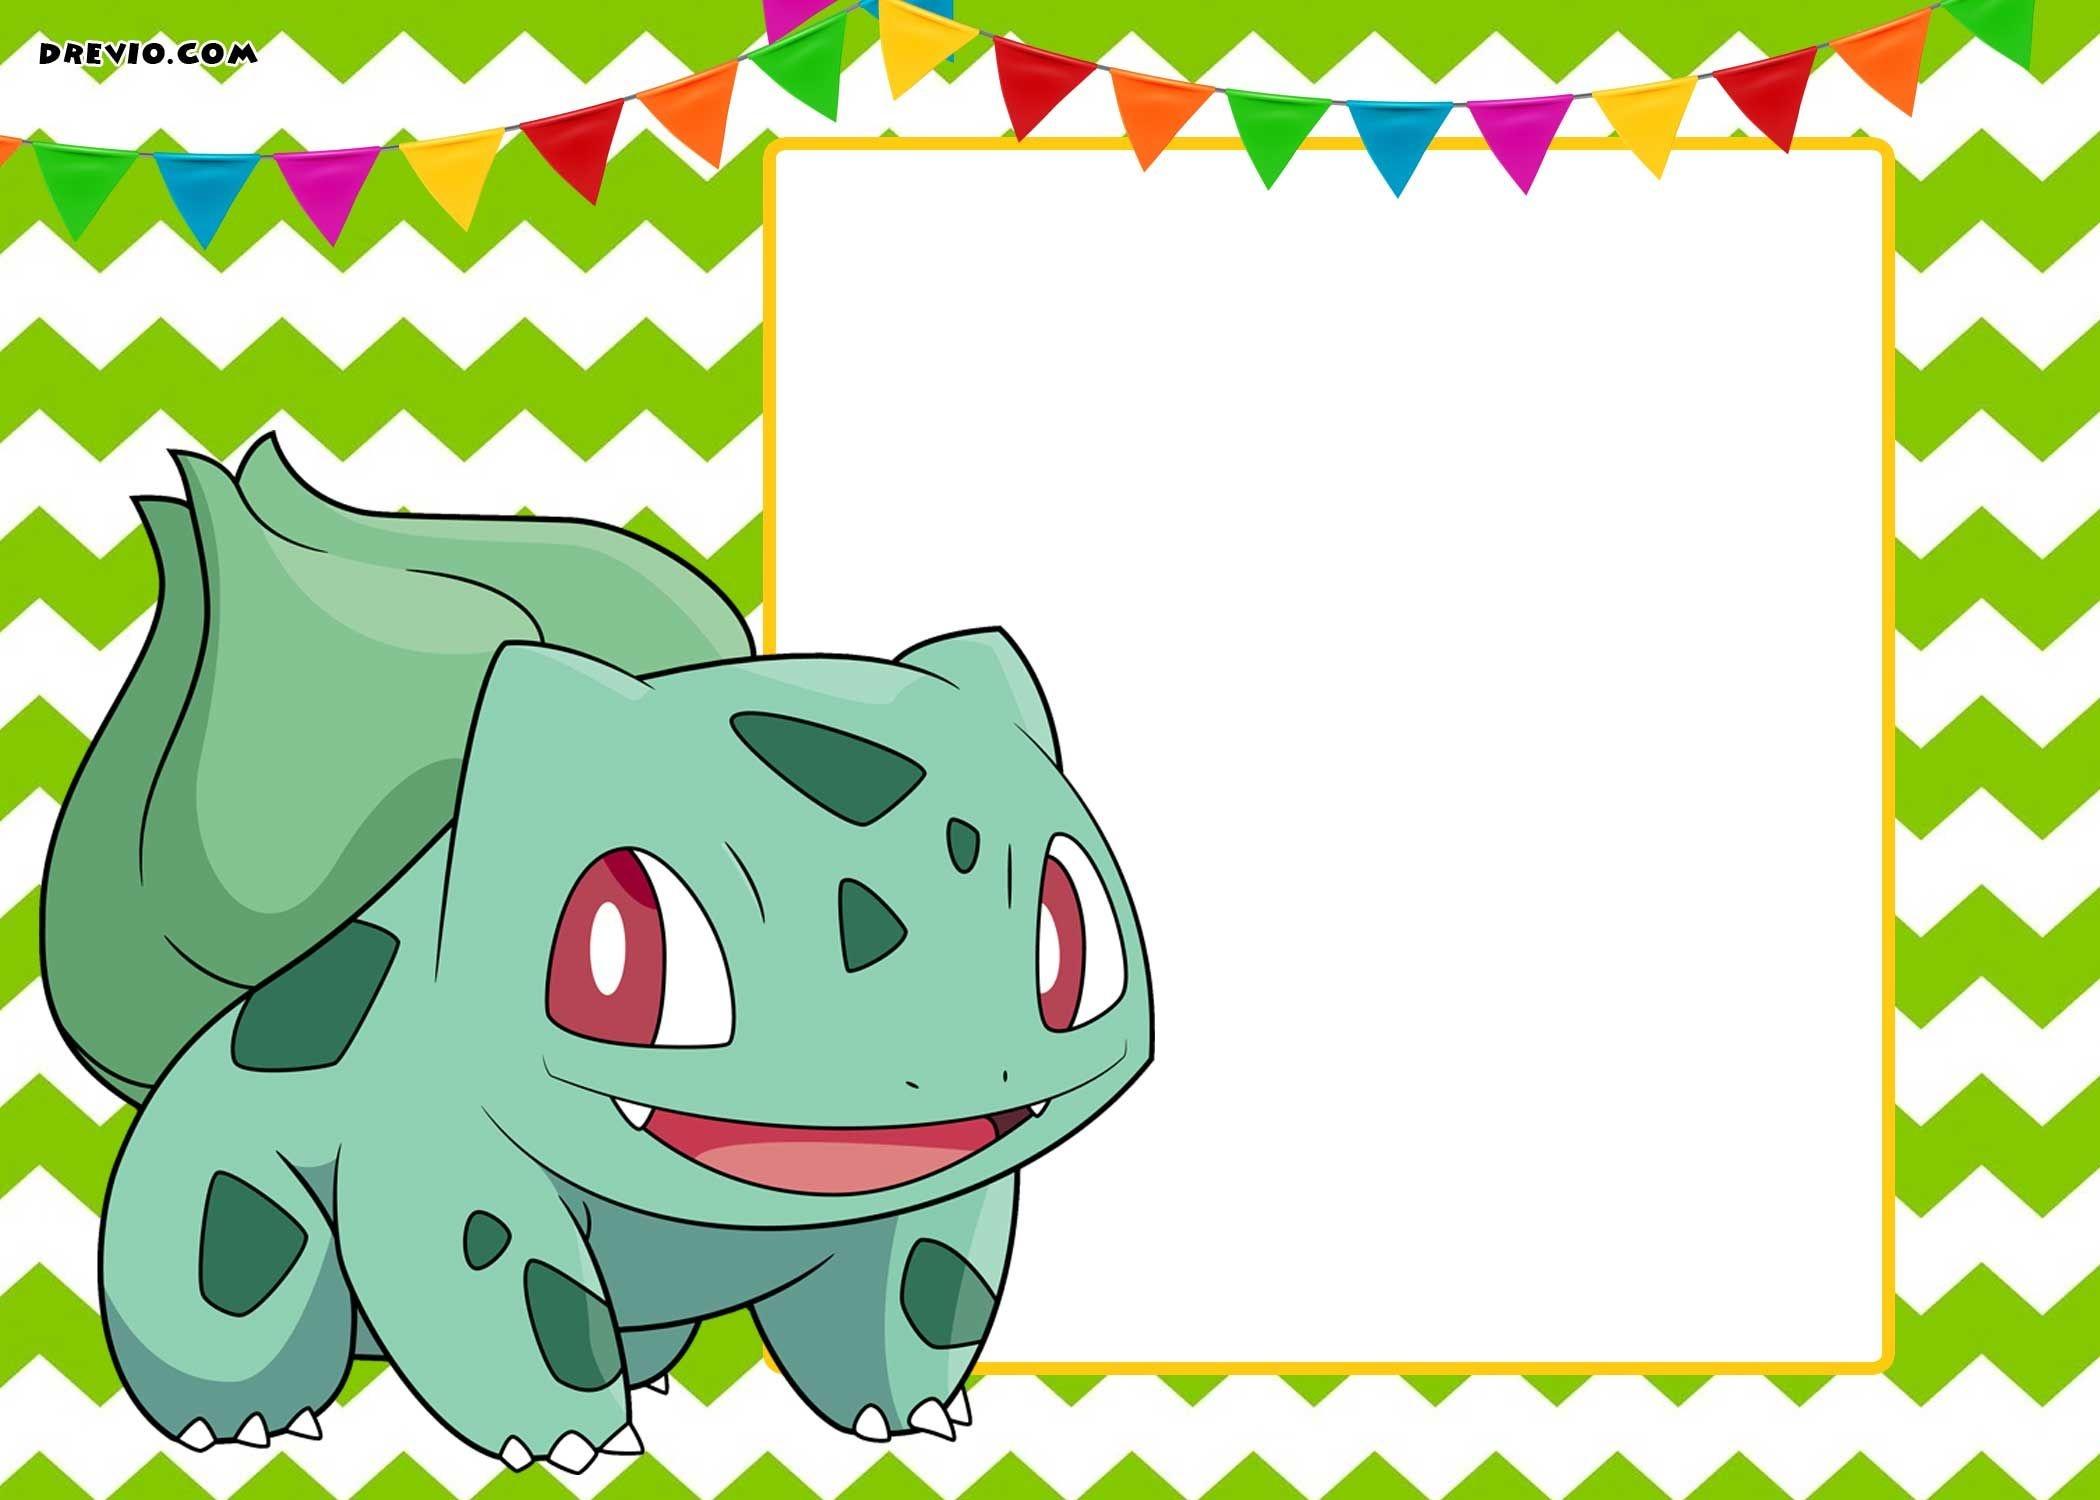 Free Printable Pokemon Invitation Templates | Free Printable - Free Printable Pokemon Birthday Invitations